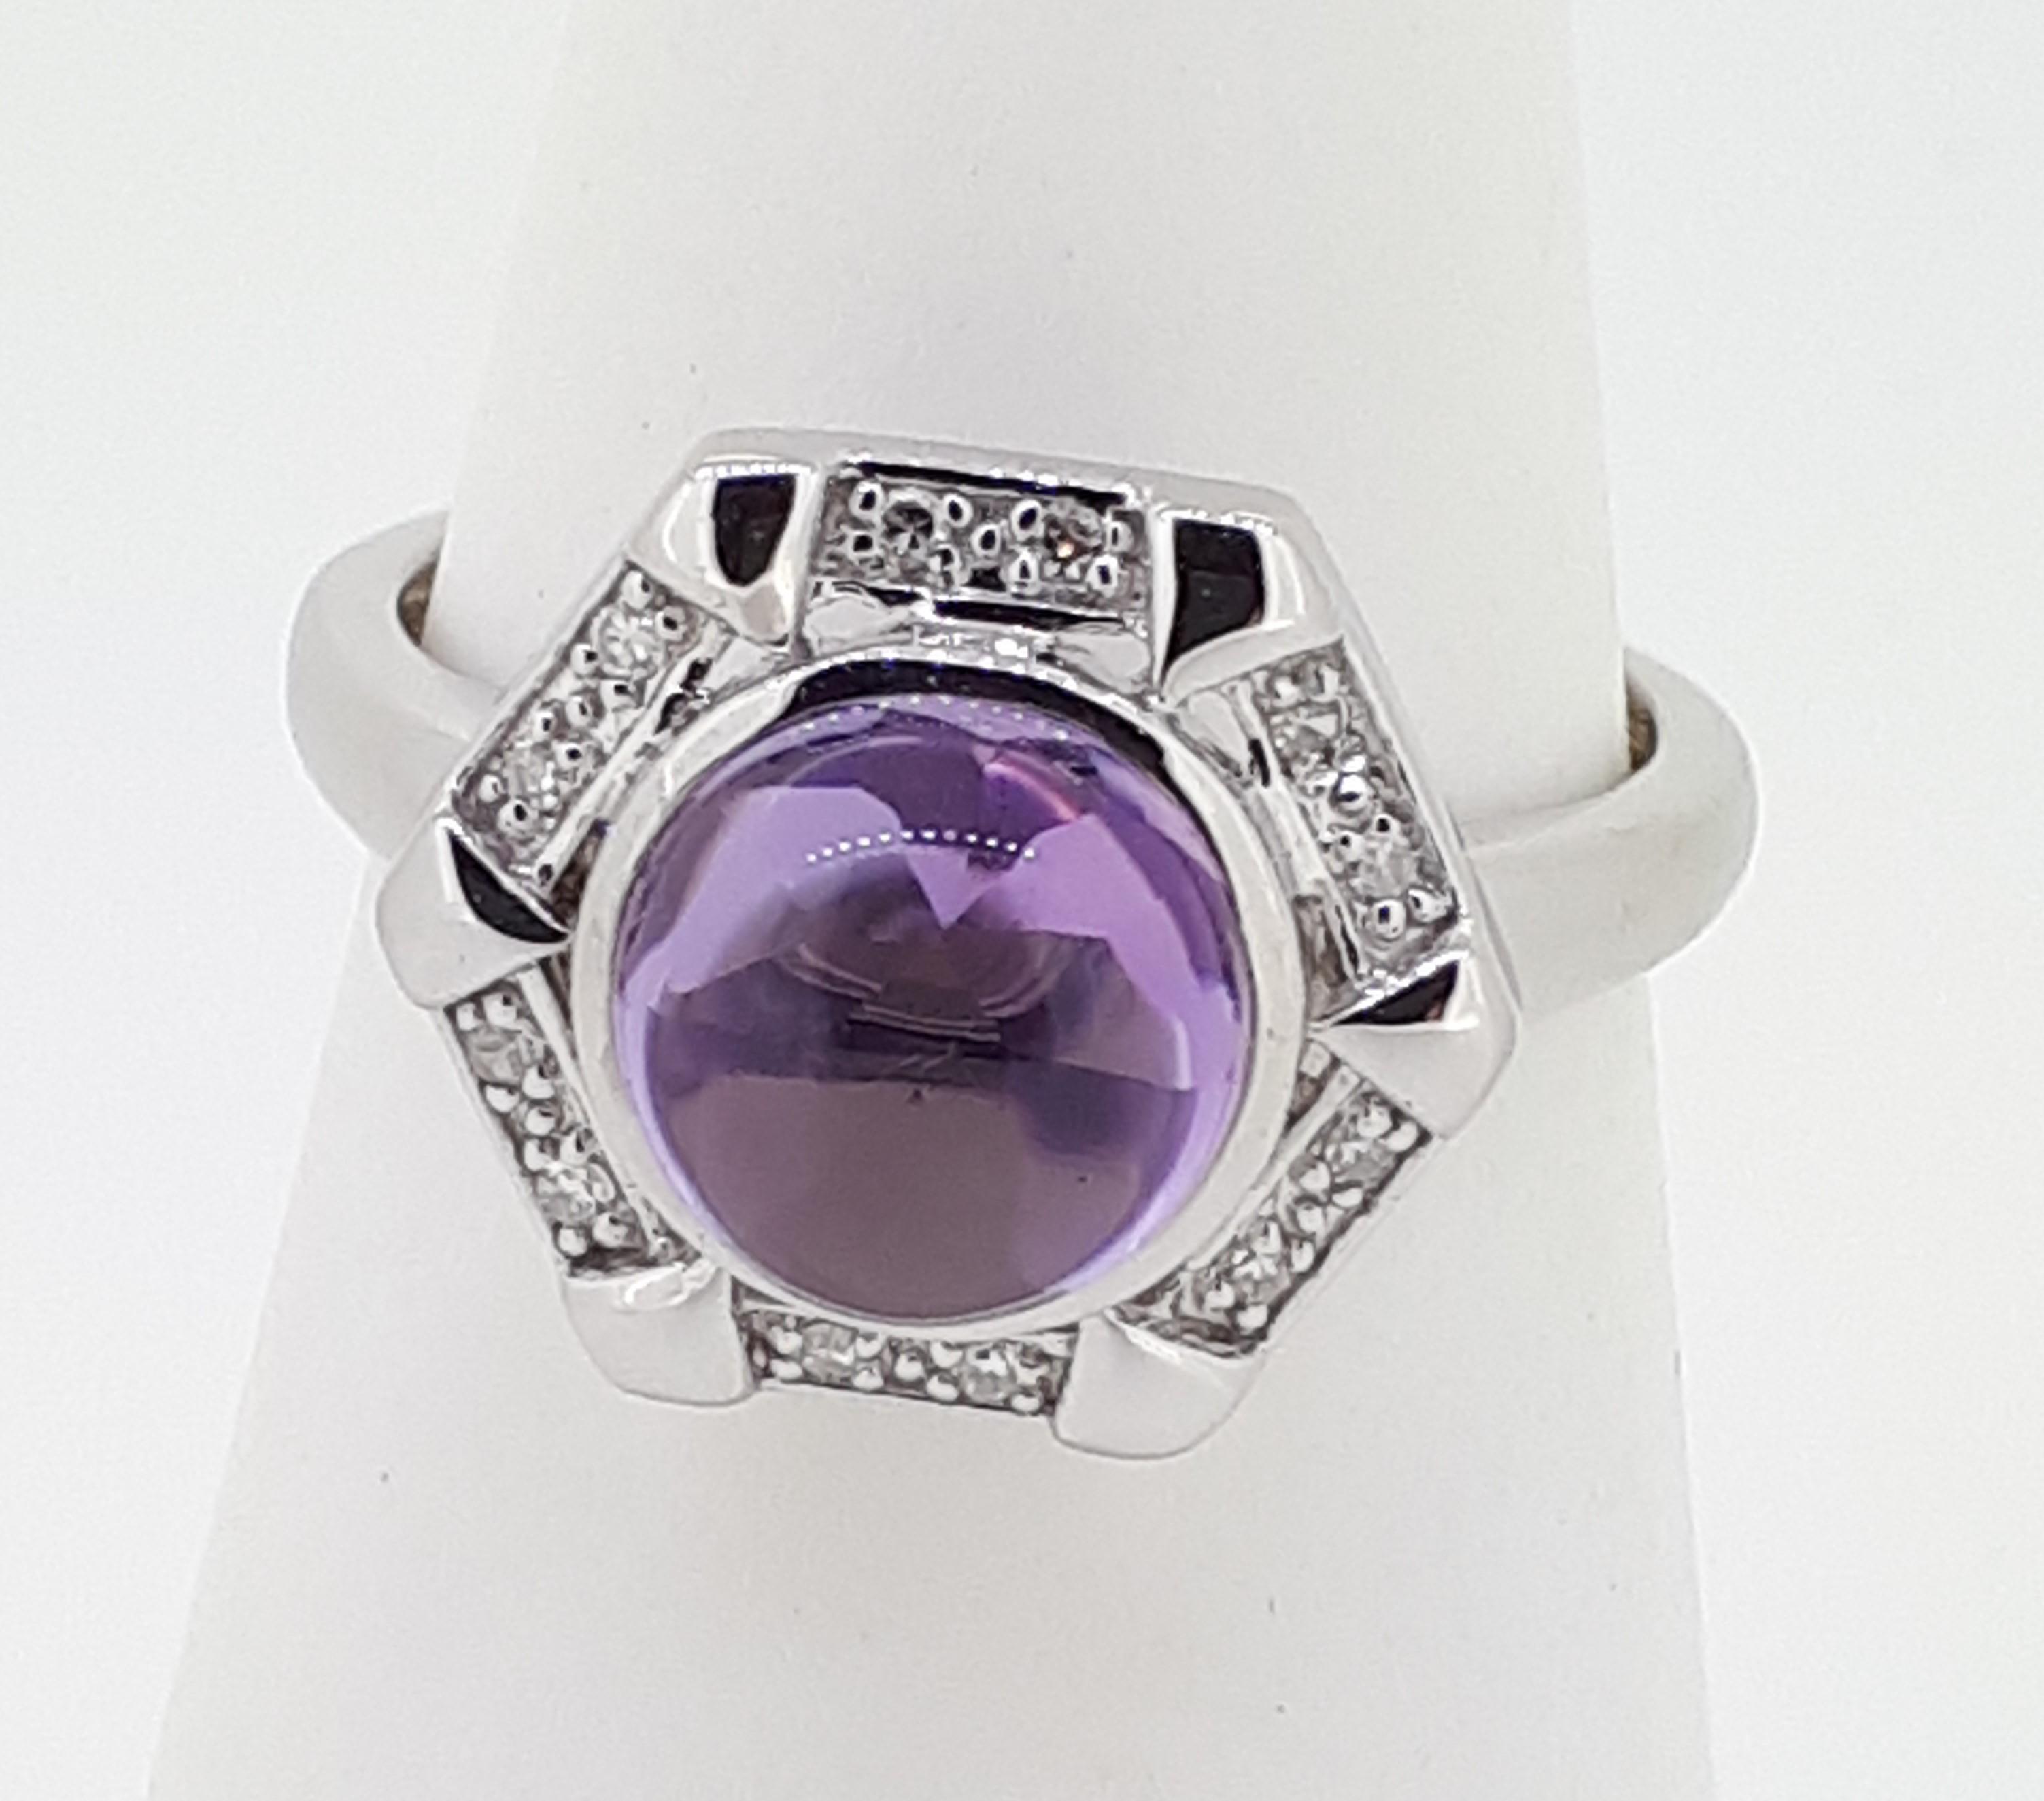 9ct White Gold Cabochon Amethyst & Diamond Ring